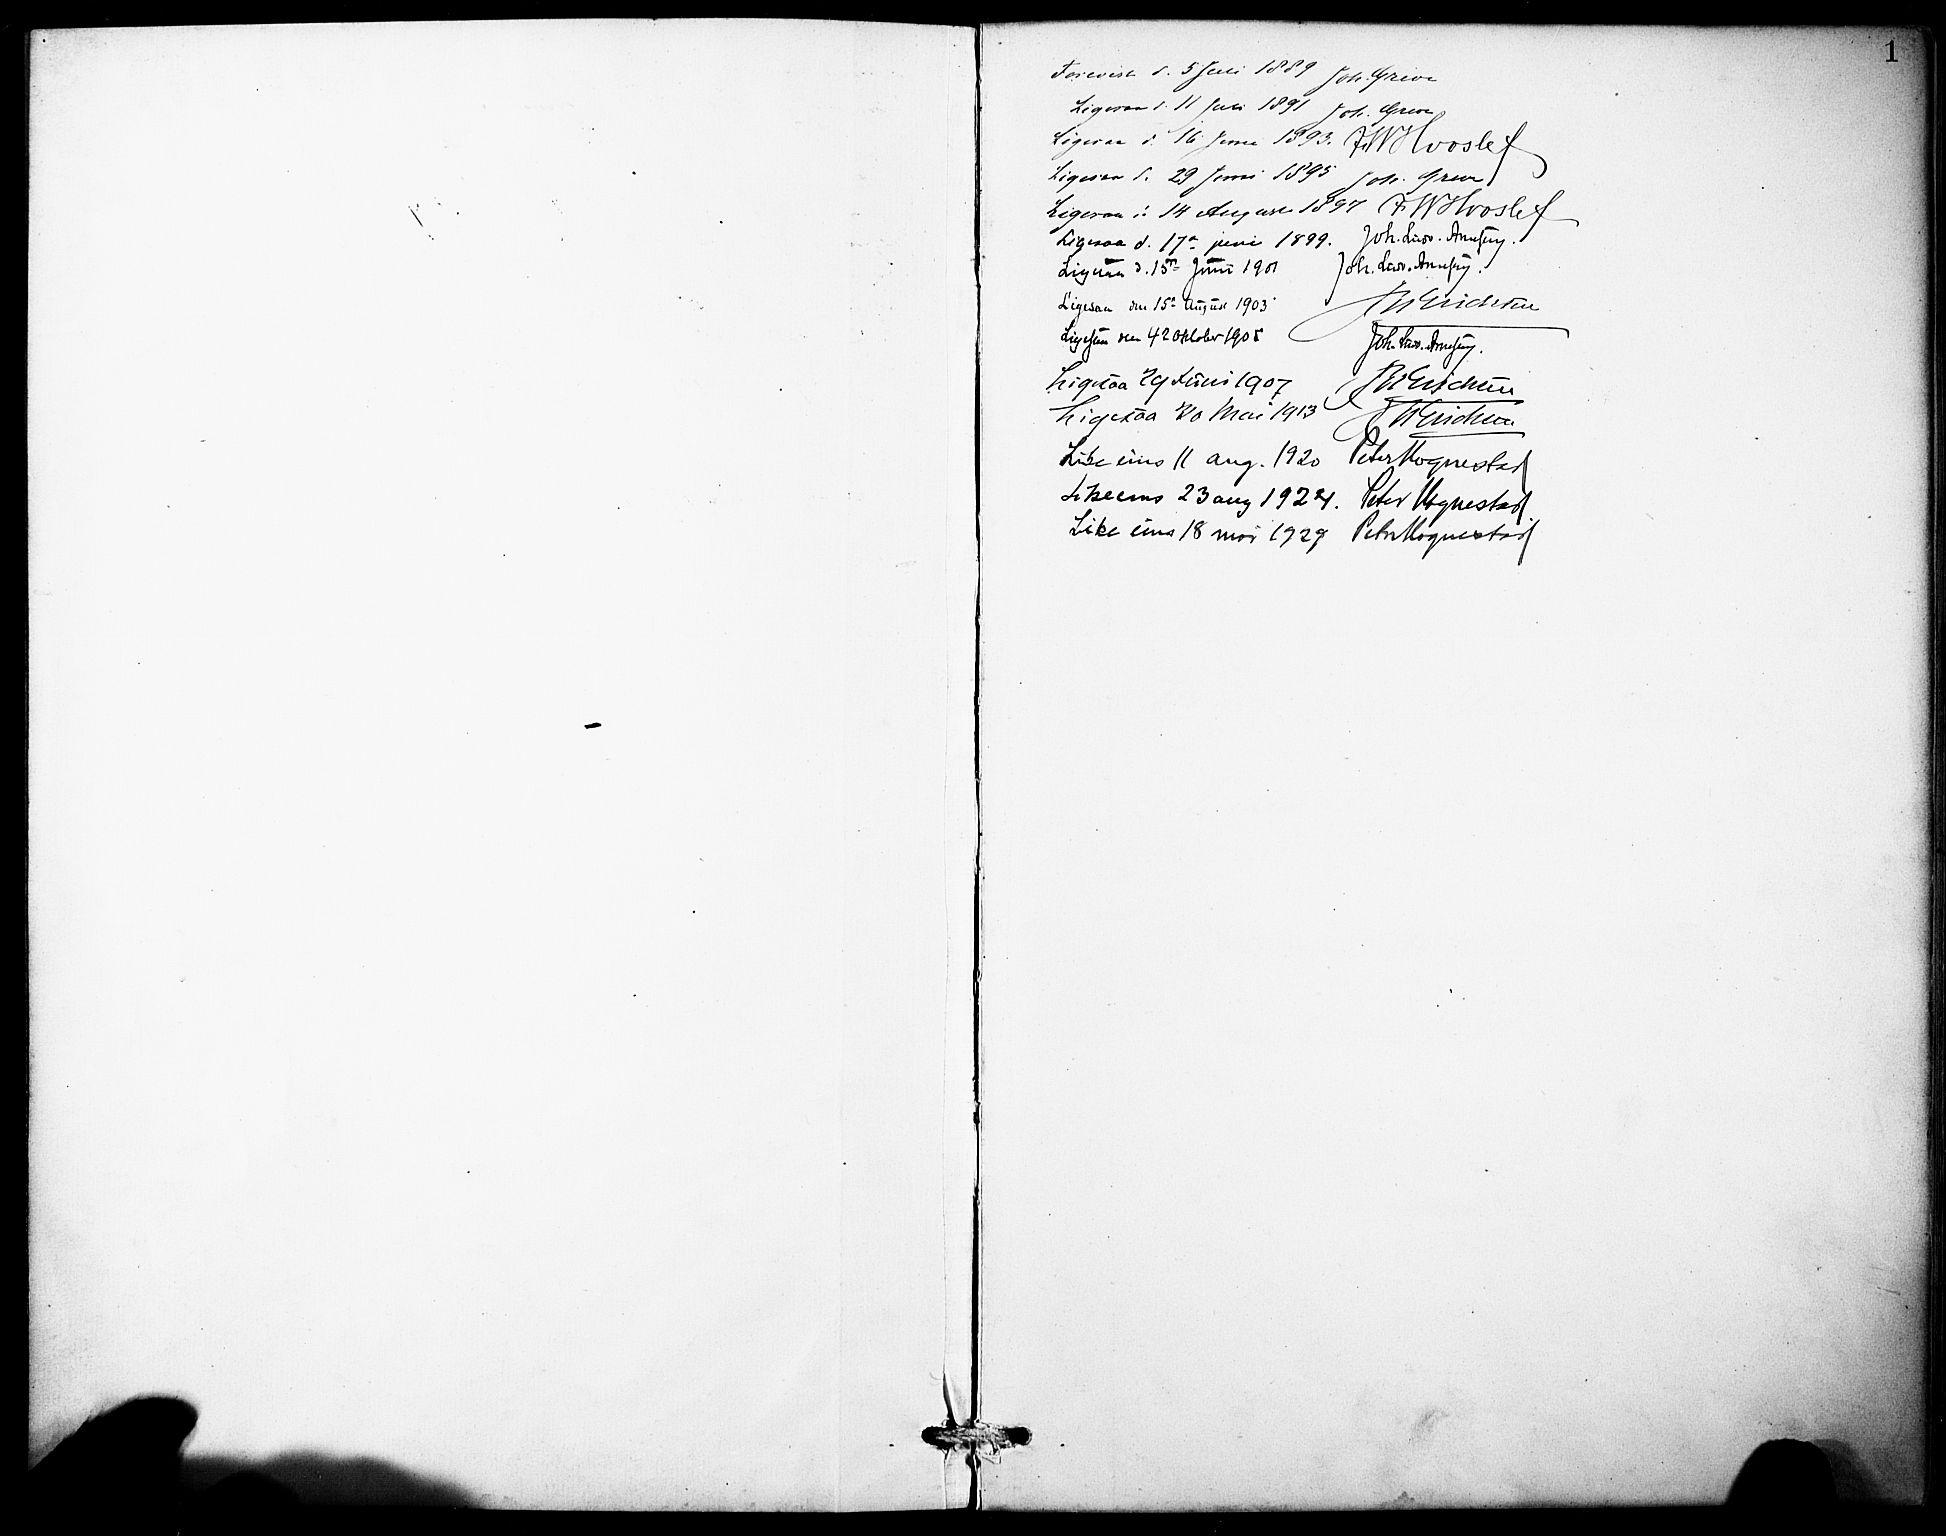 SAB, Aurland Sokneprestembete*, Parish register (copy) no. B 2, 1887-1929, p. 1